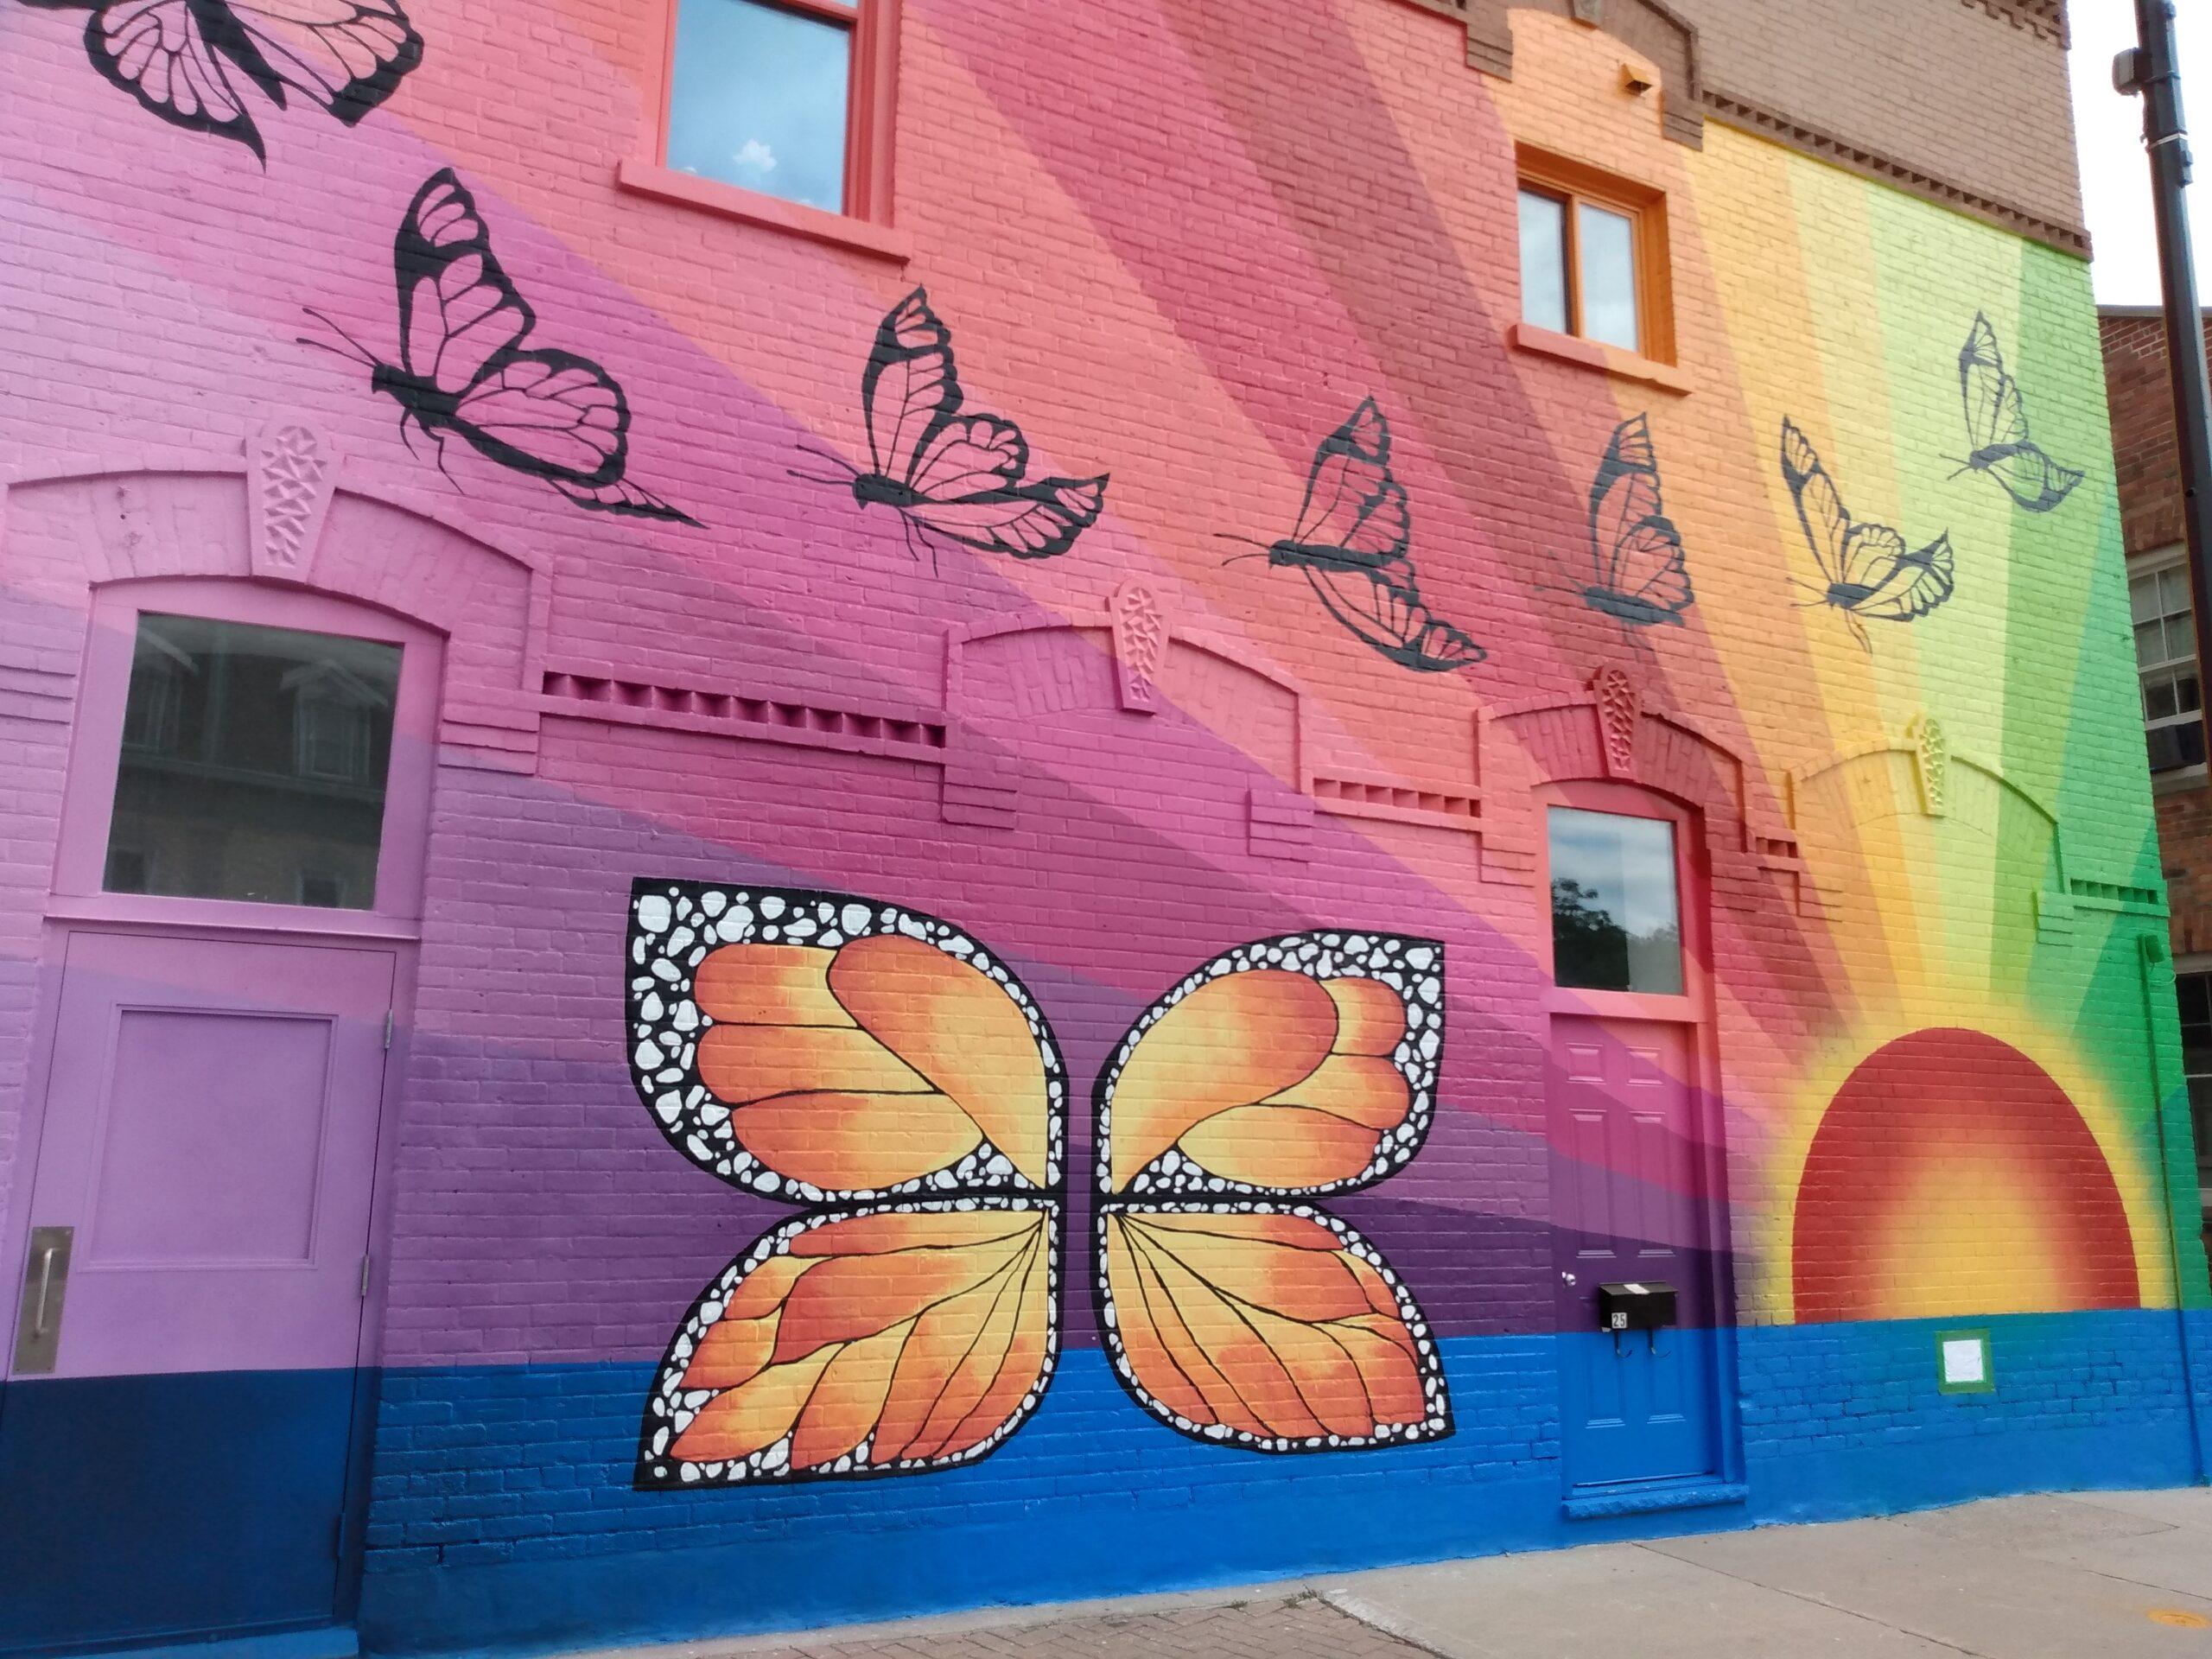 Butterfly Mural in Goderich